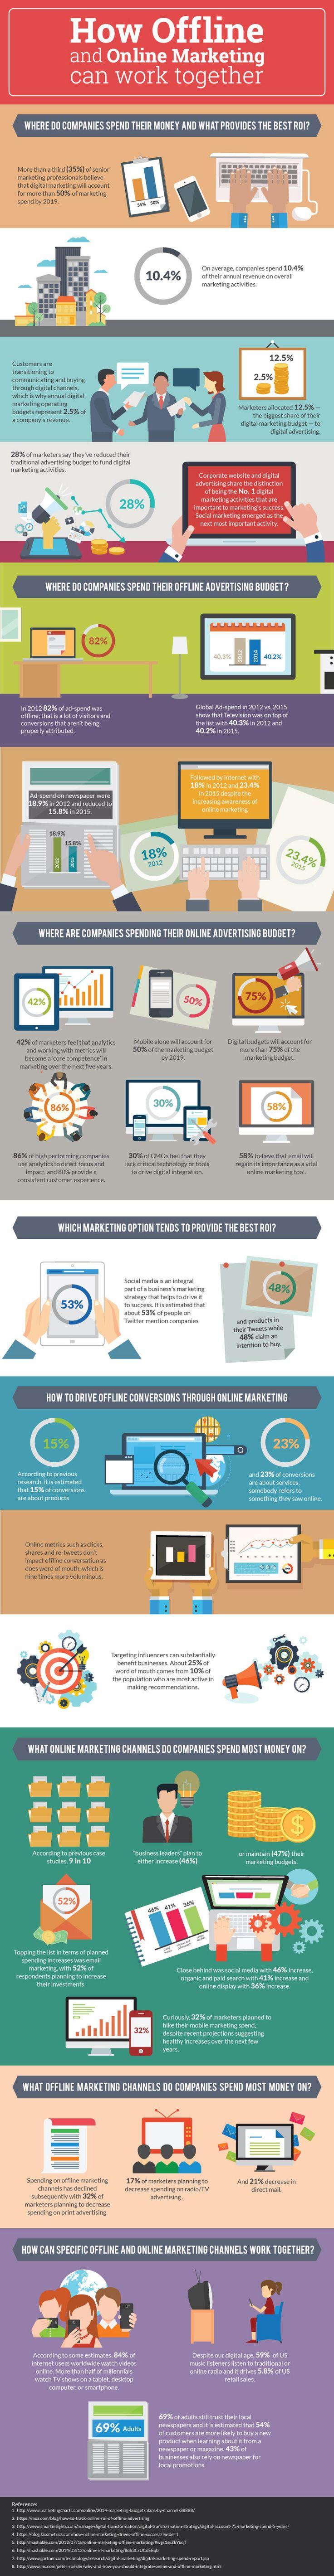 How Offline And Online Marketing Can Work Together: http://blog.hubspot.com/marketing/online-offline-marketing-together